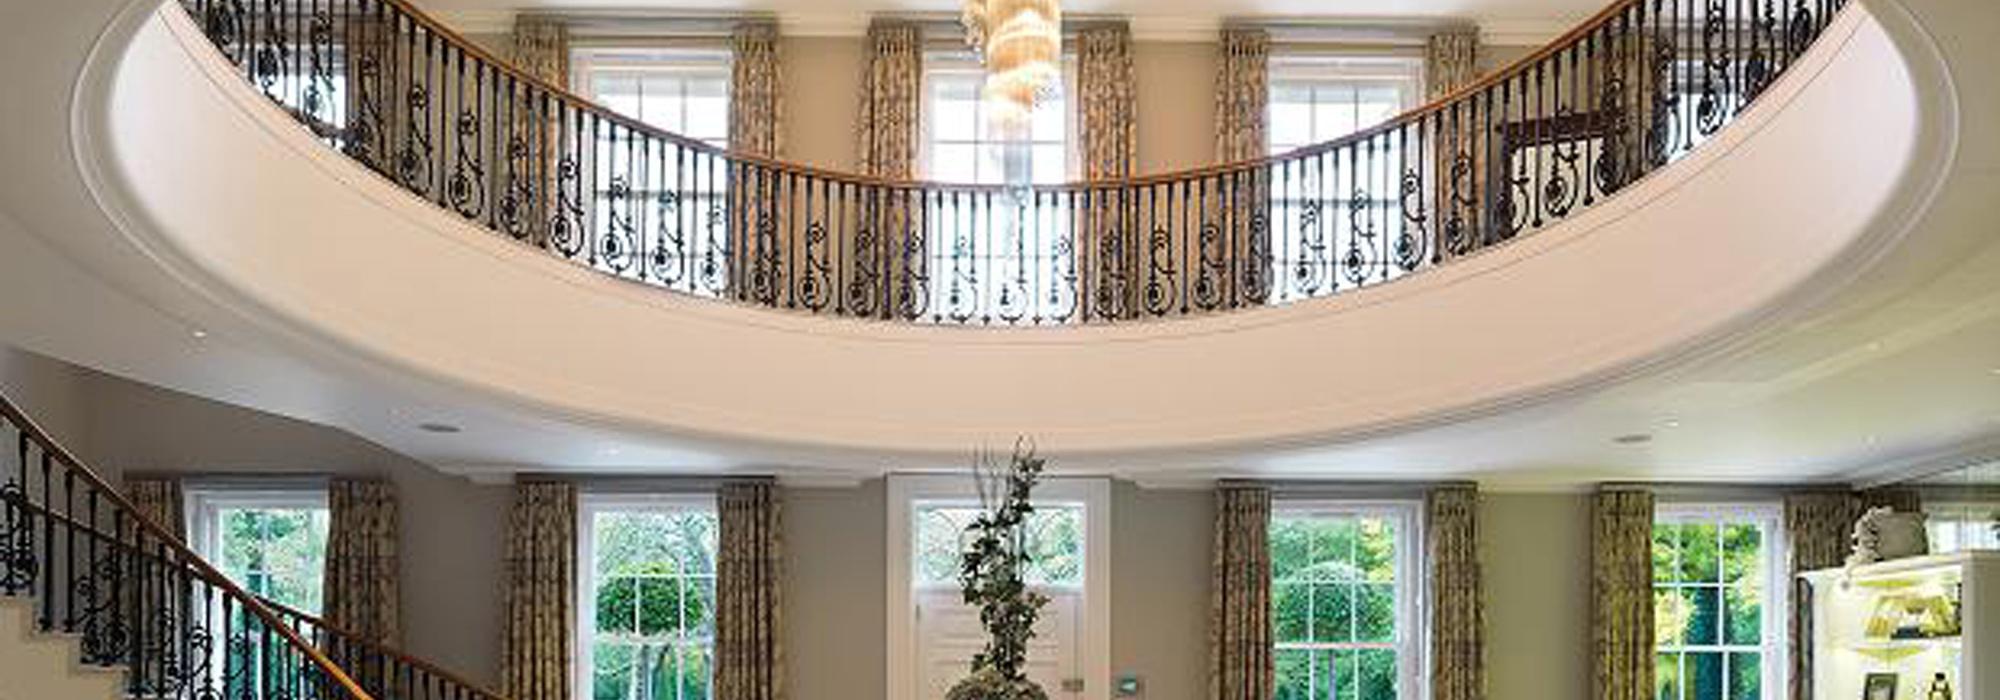 Belgravia Mansion, London